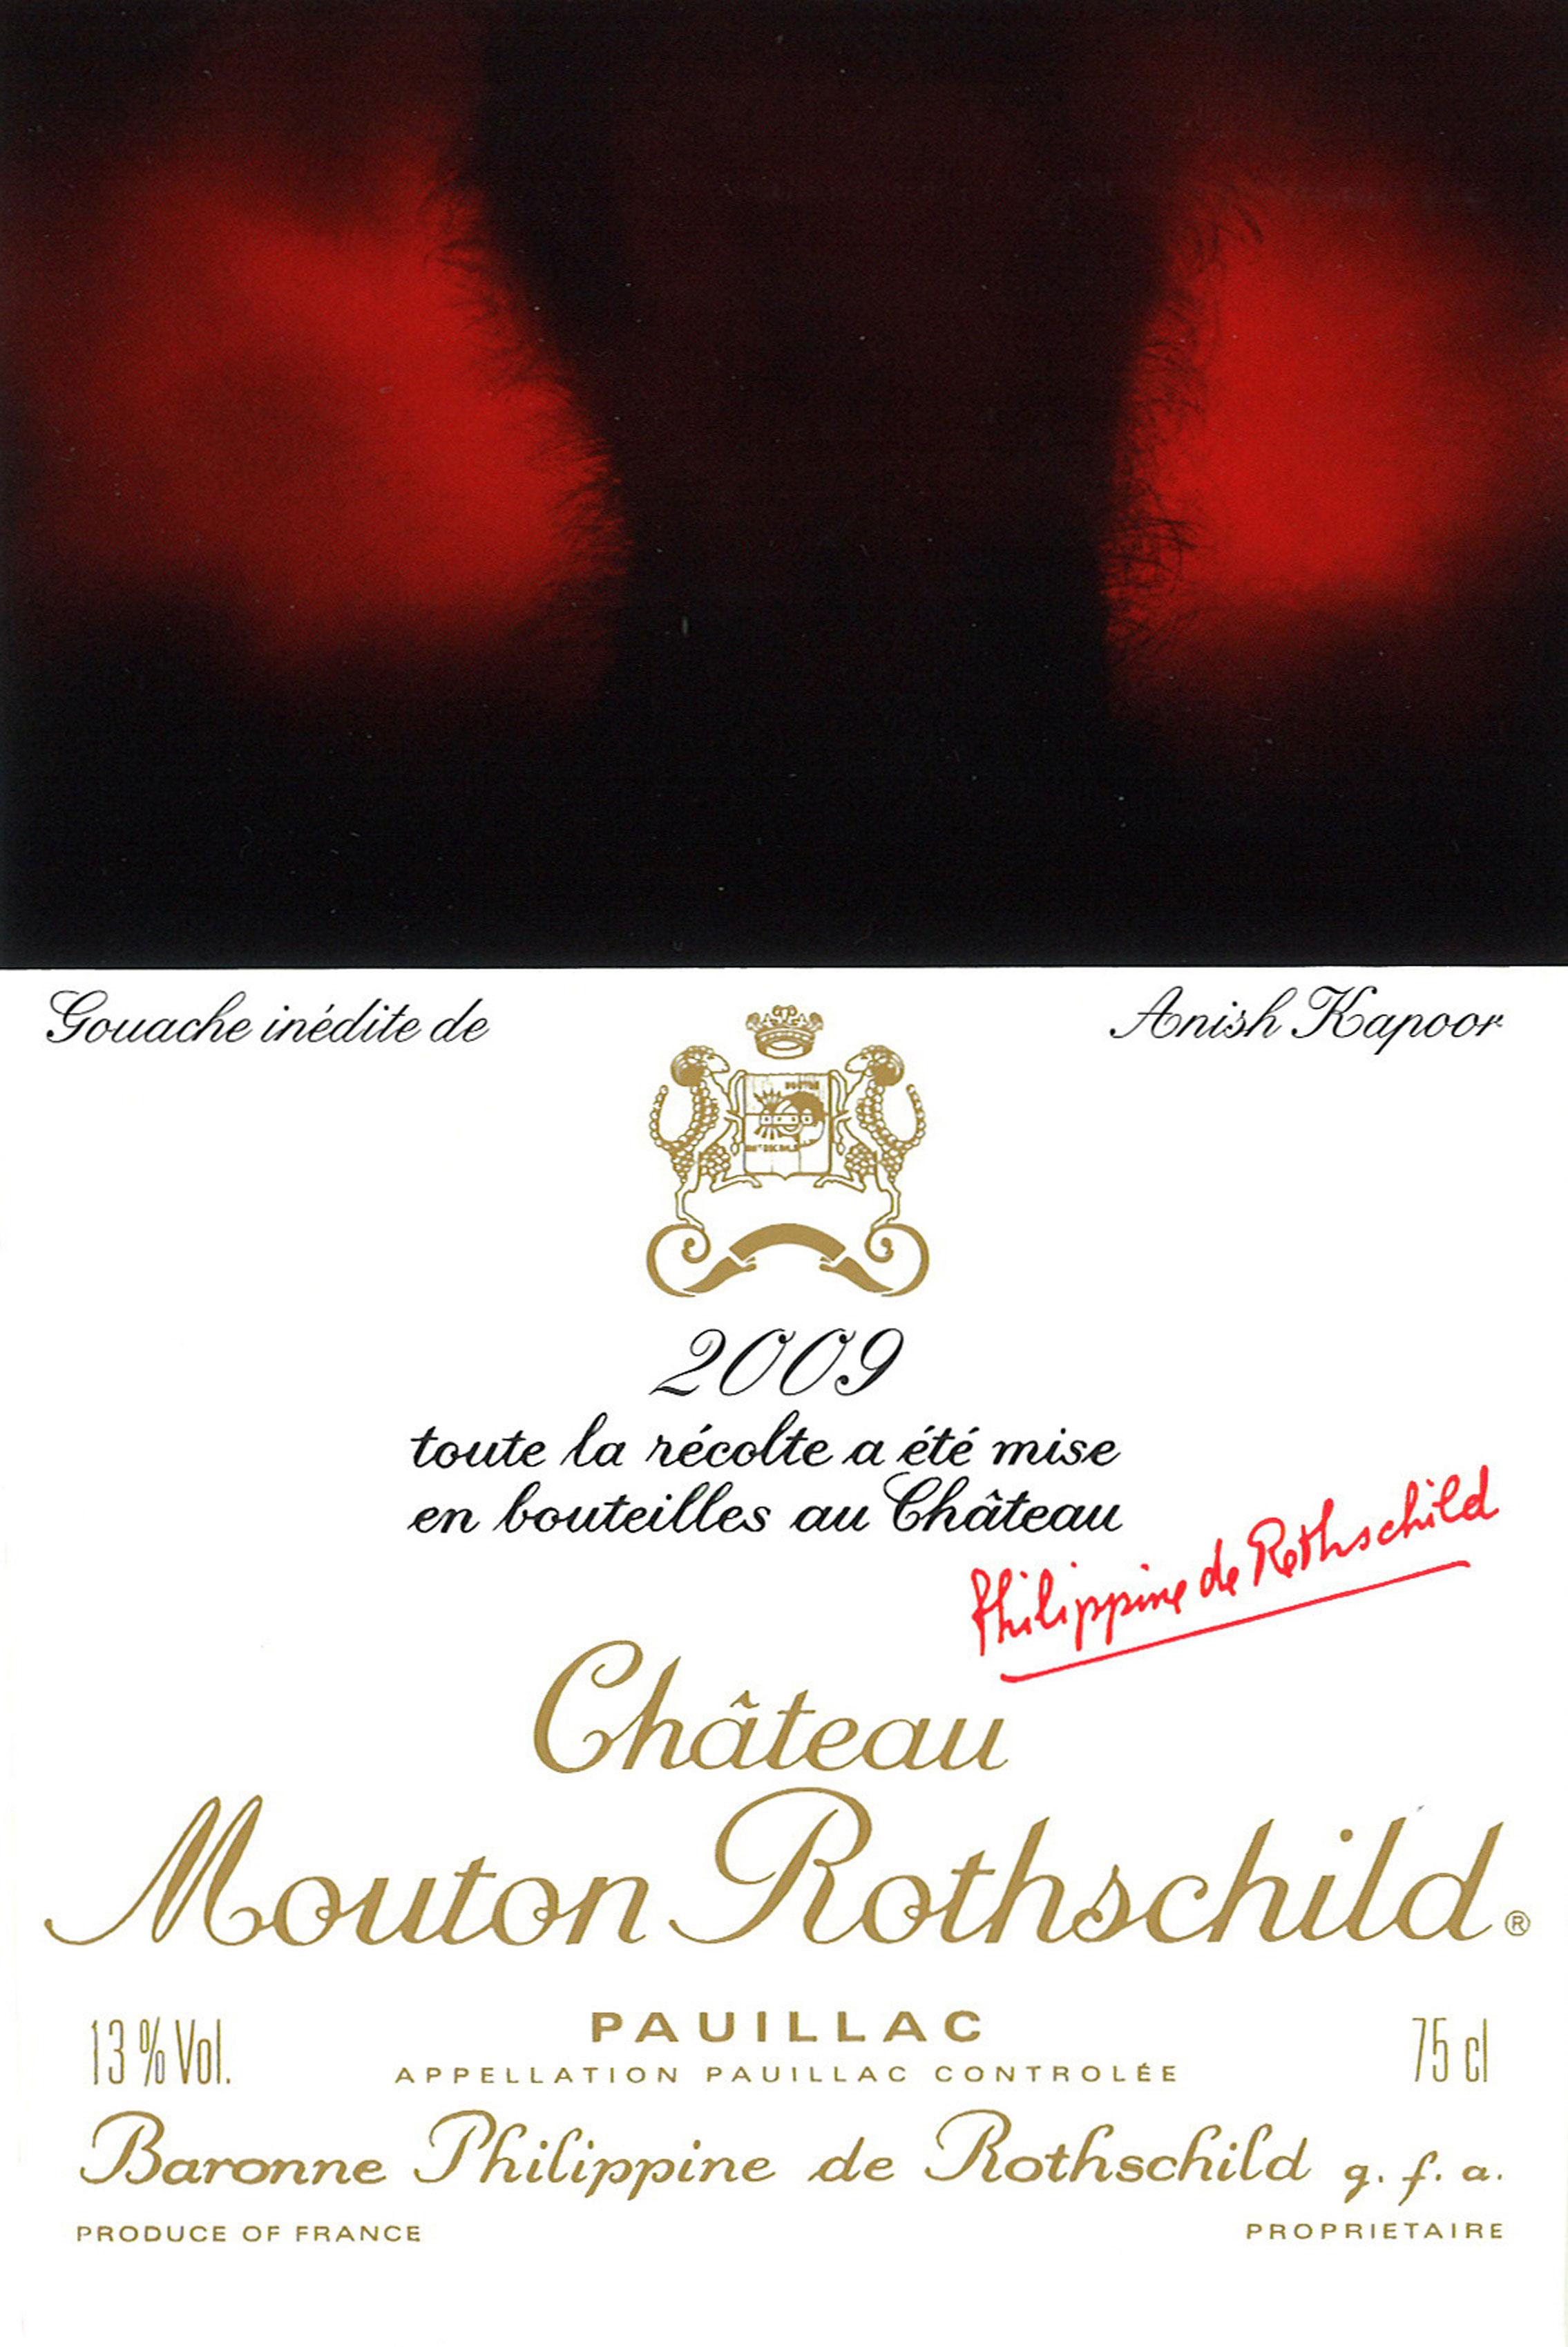 Anish Kapoor - Etiquette Mouton Rothschild 2009